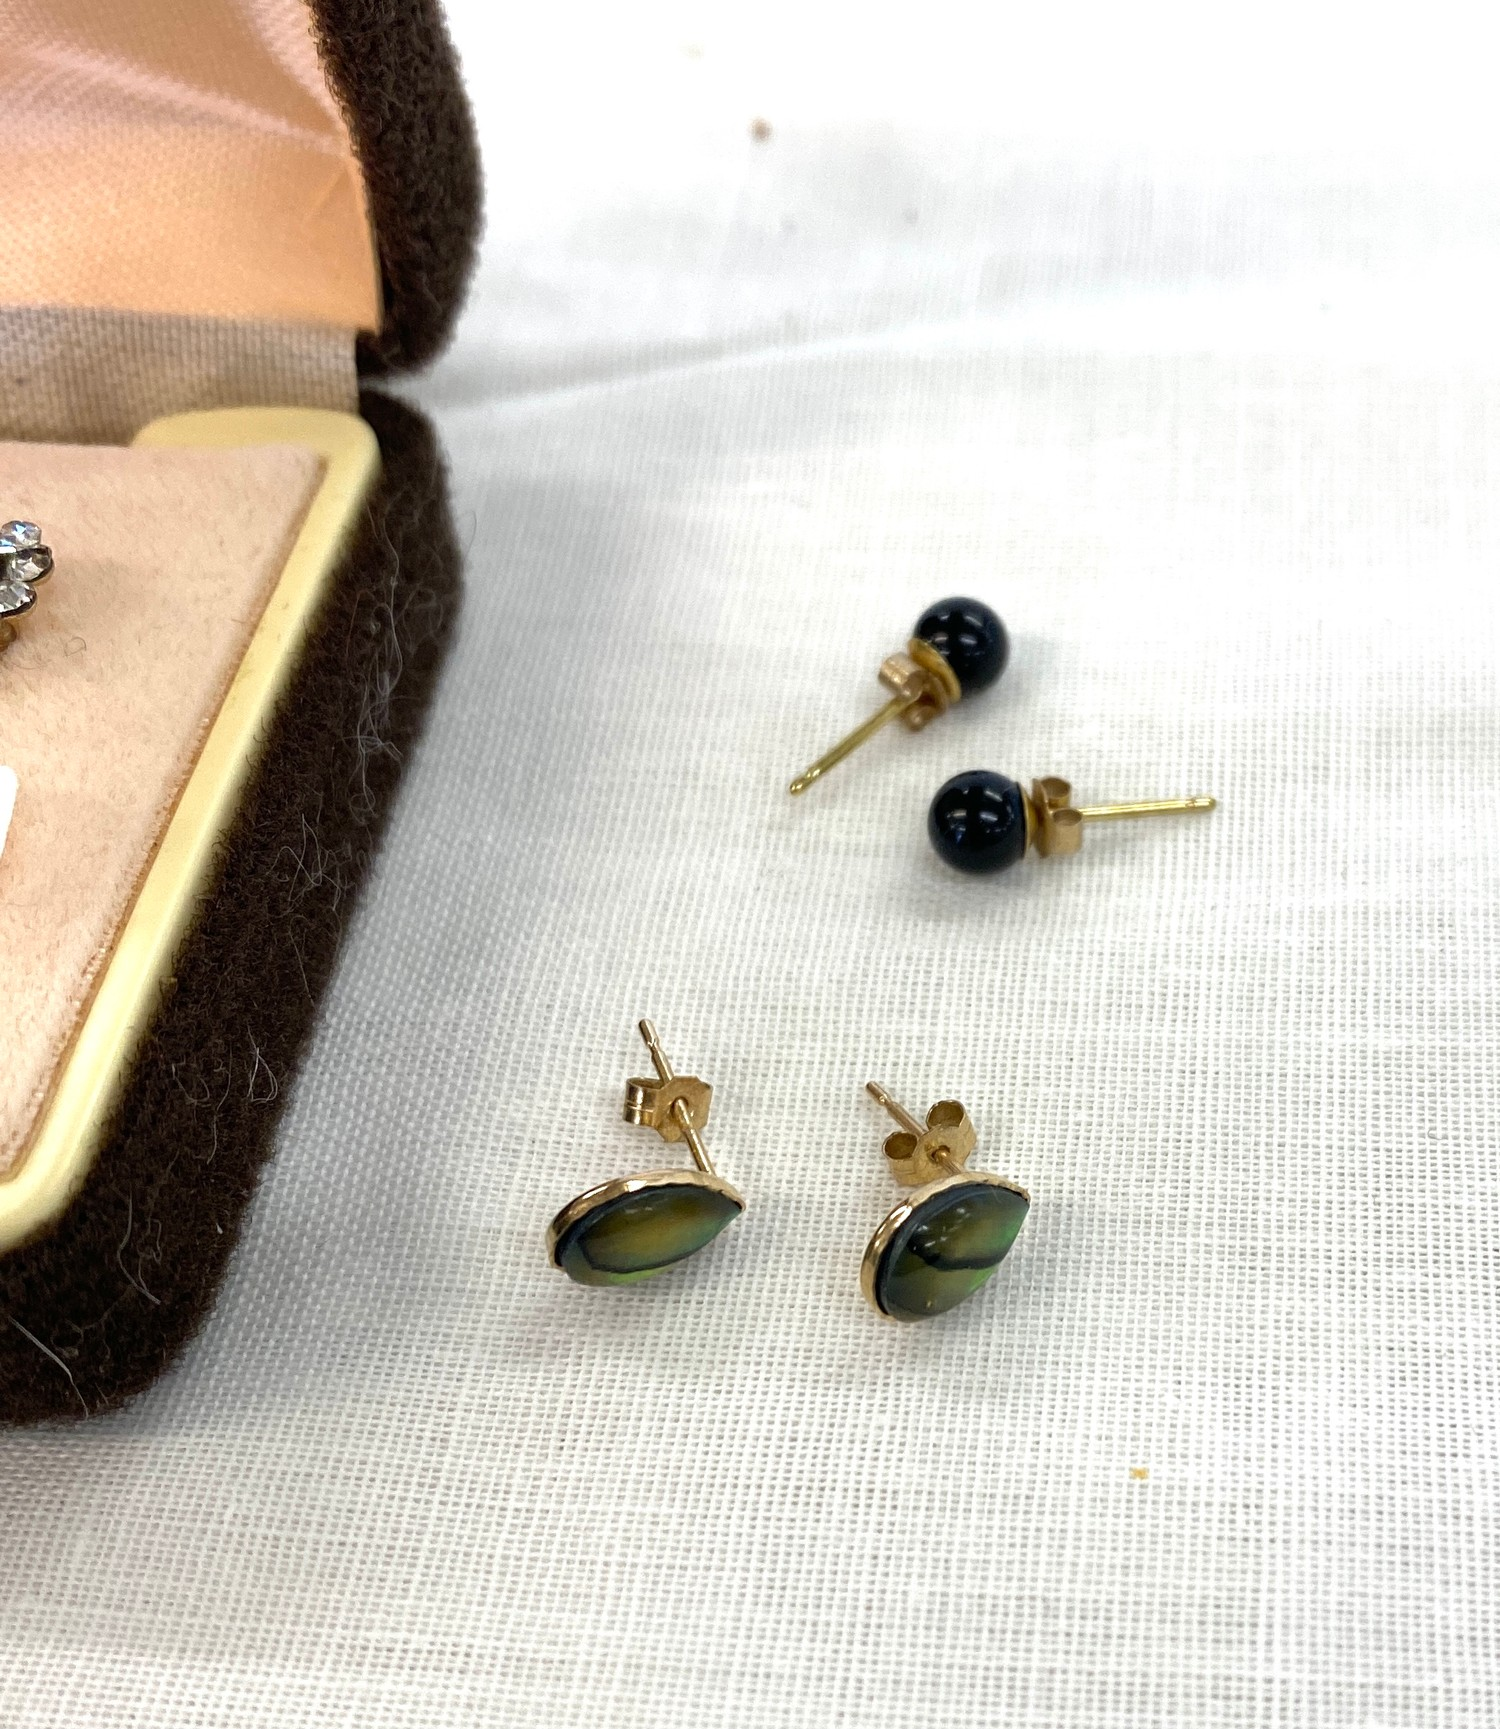 3 Pairs of 9ct earrings - Image 2 of 2